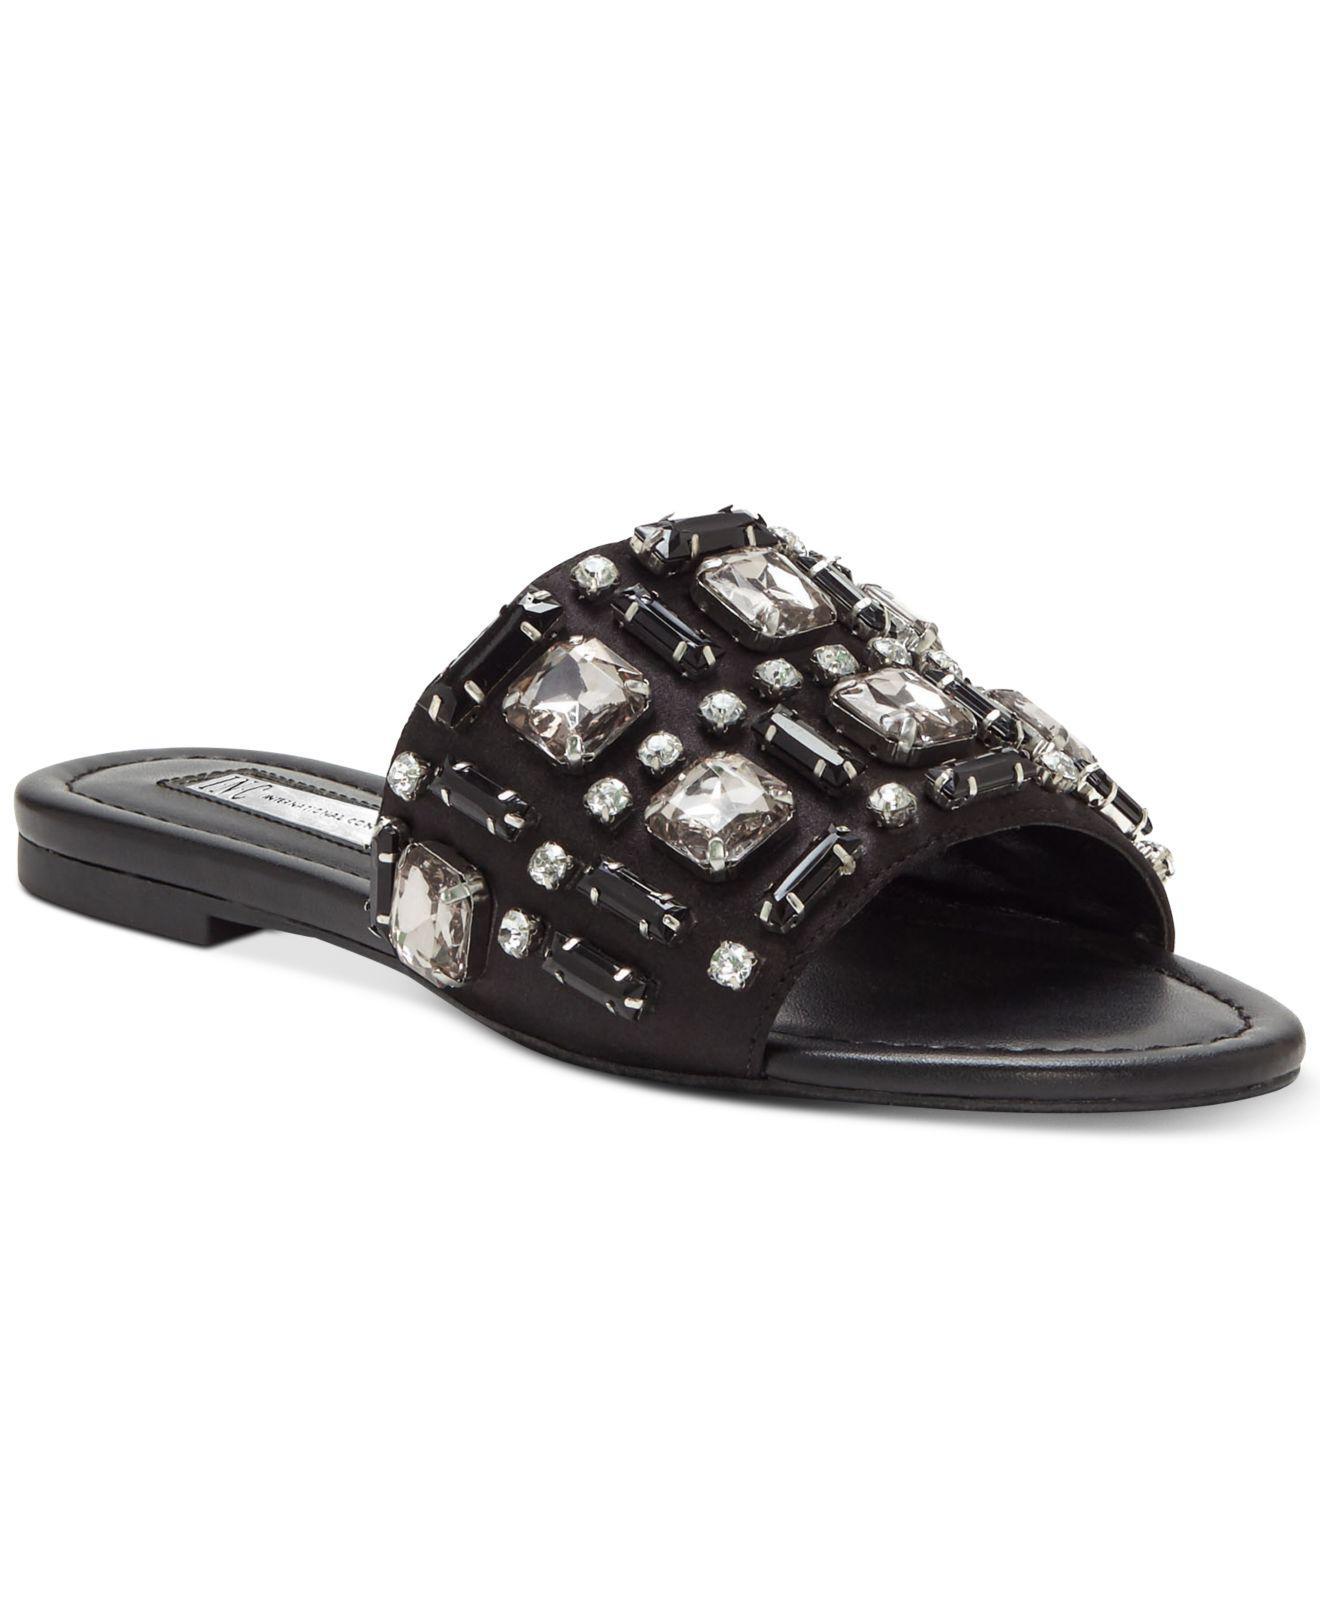 51856bc91d7be5 Lyst - INC International Concepts Gerra Slide-on Sandals in Black